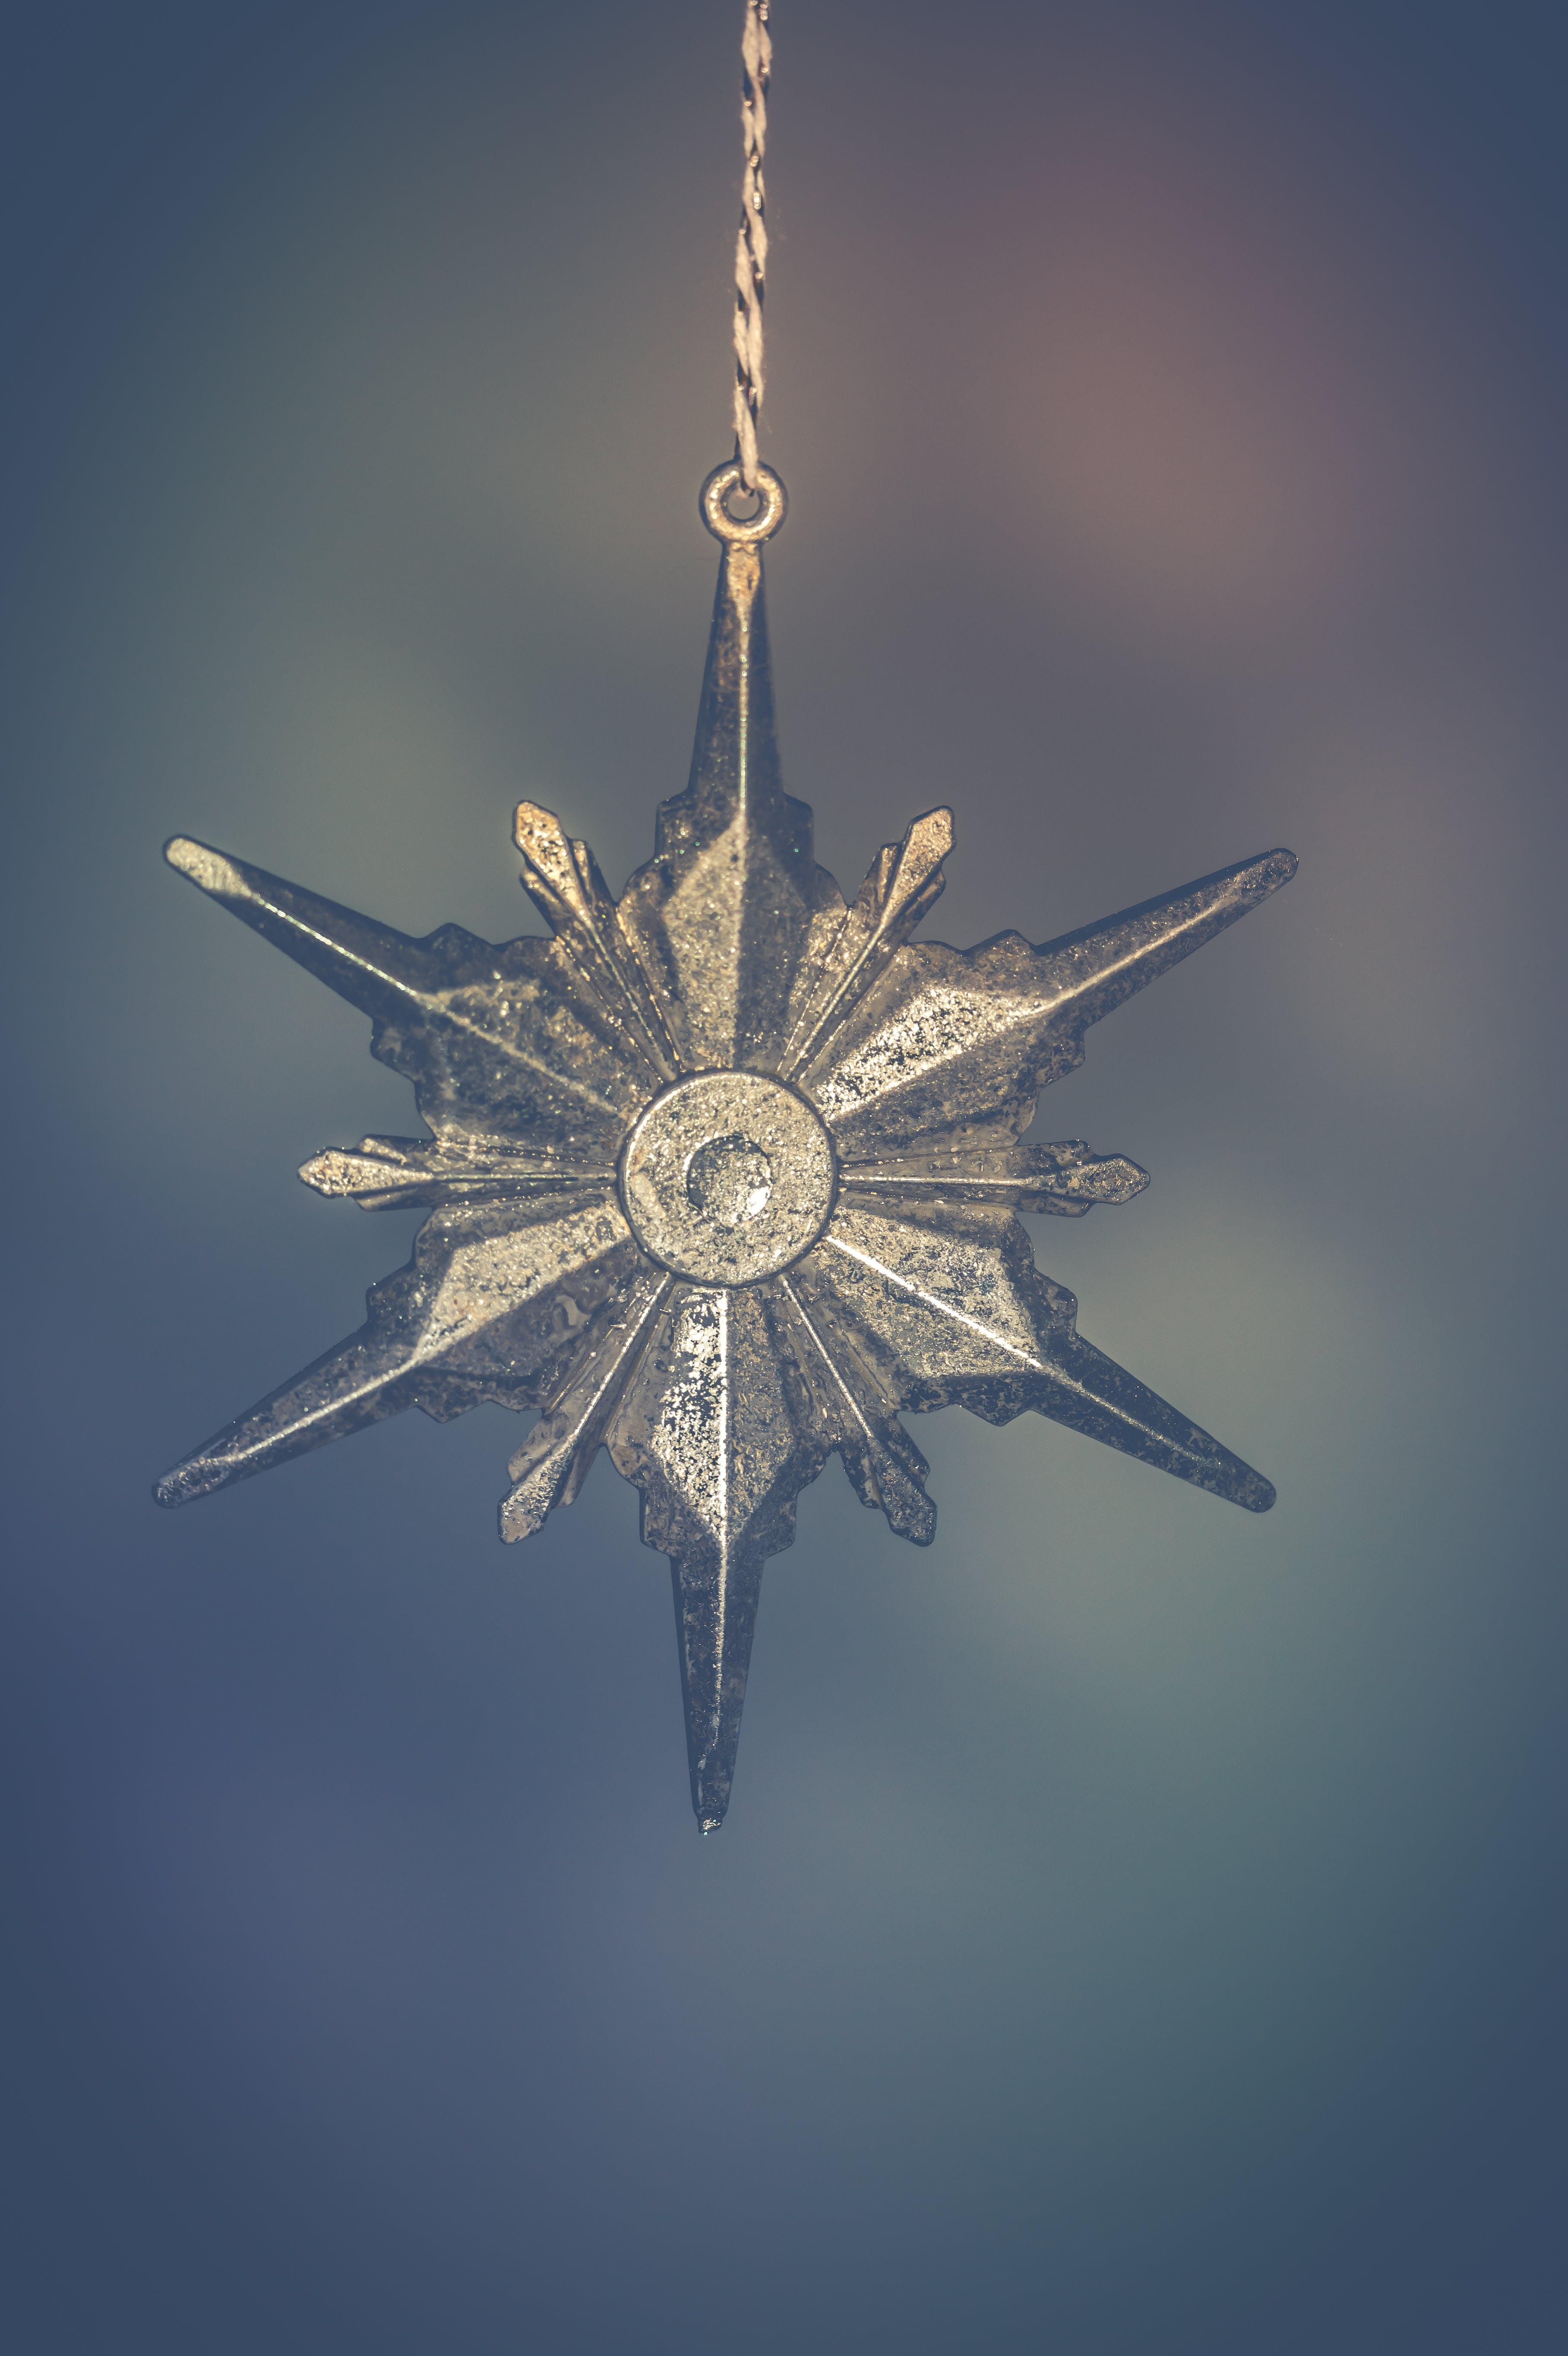 Gray-metallic Star-shaped Decor